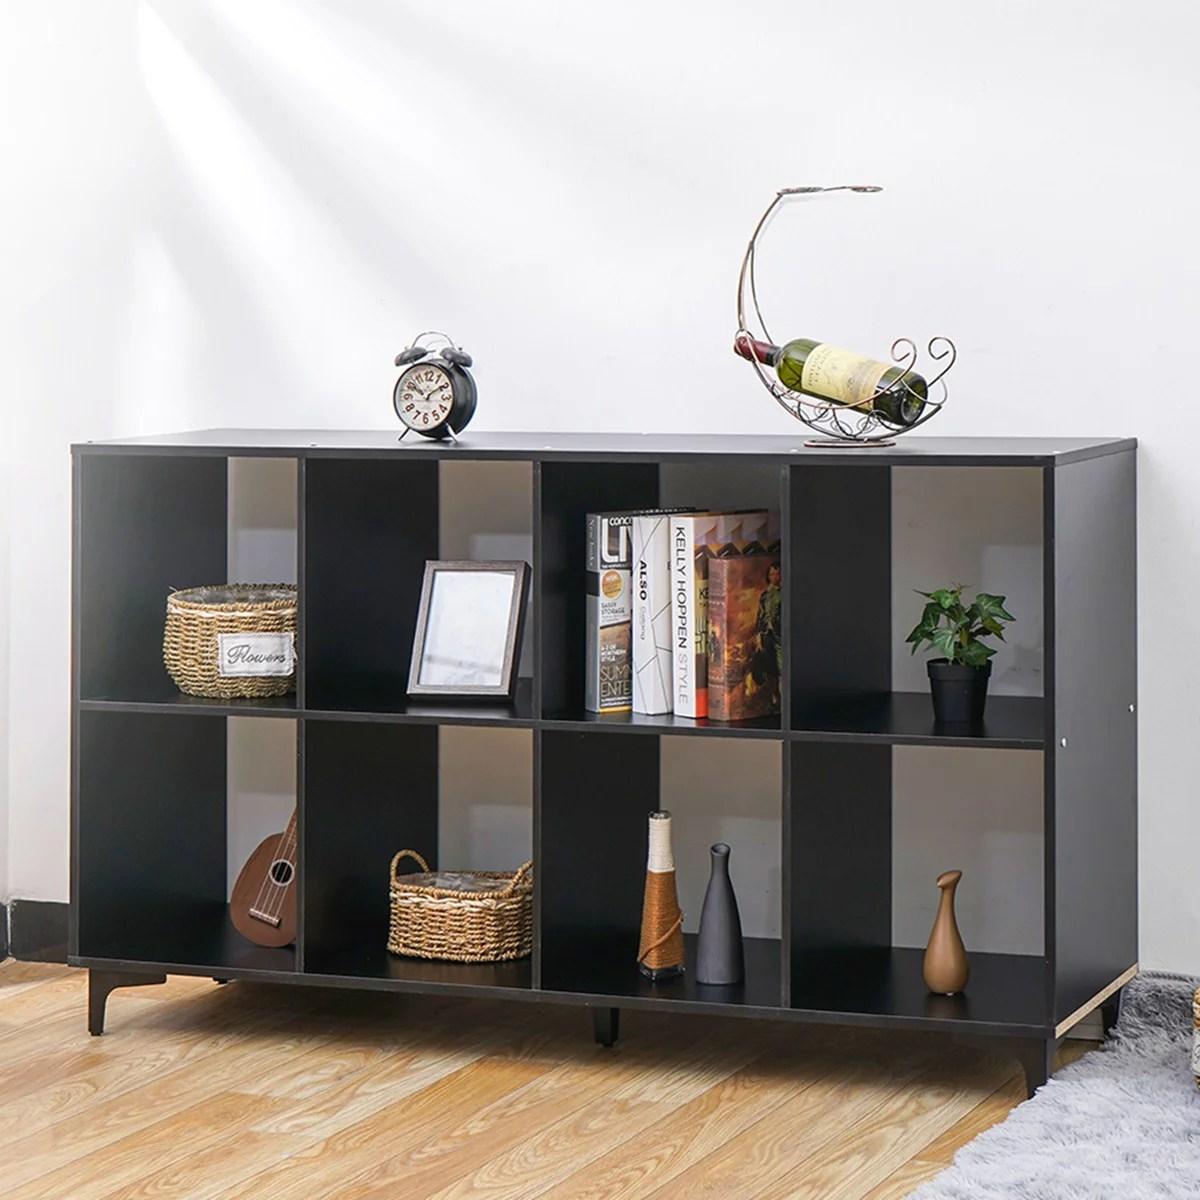 insma cube storage organizer with metal base bookshleves and bookcase bookshelf tv stand shelf black